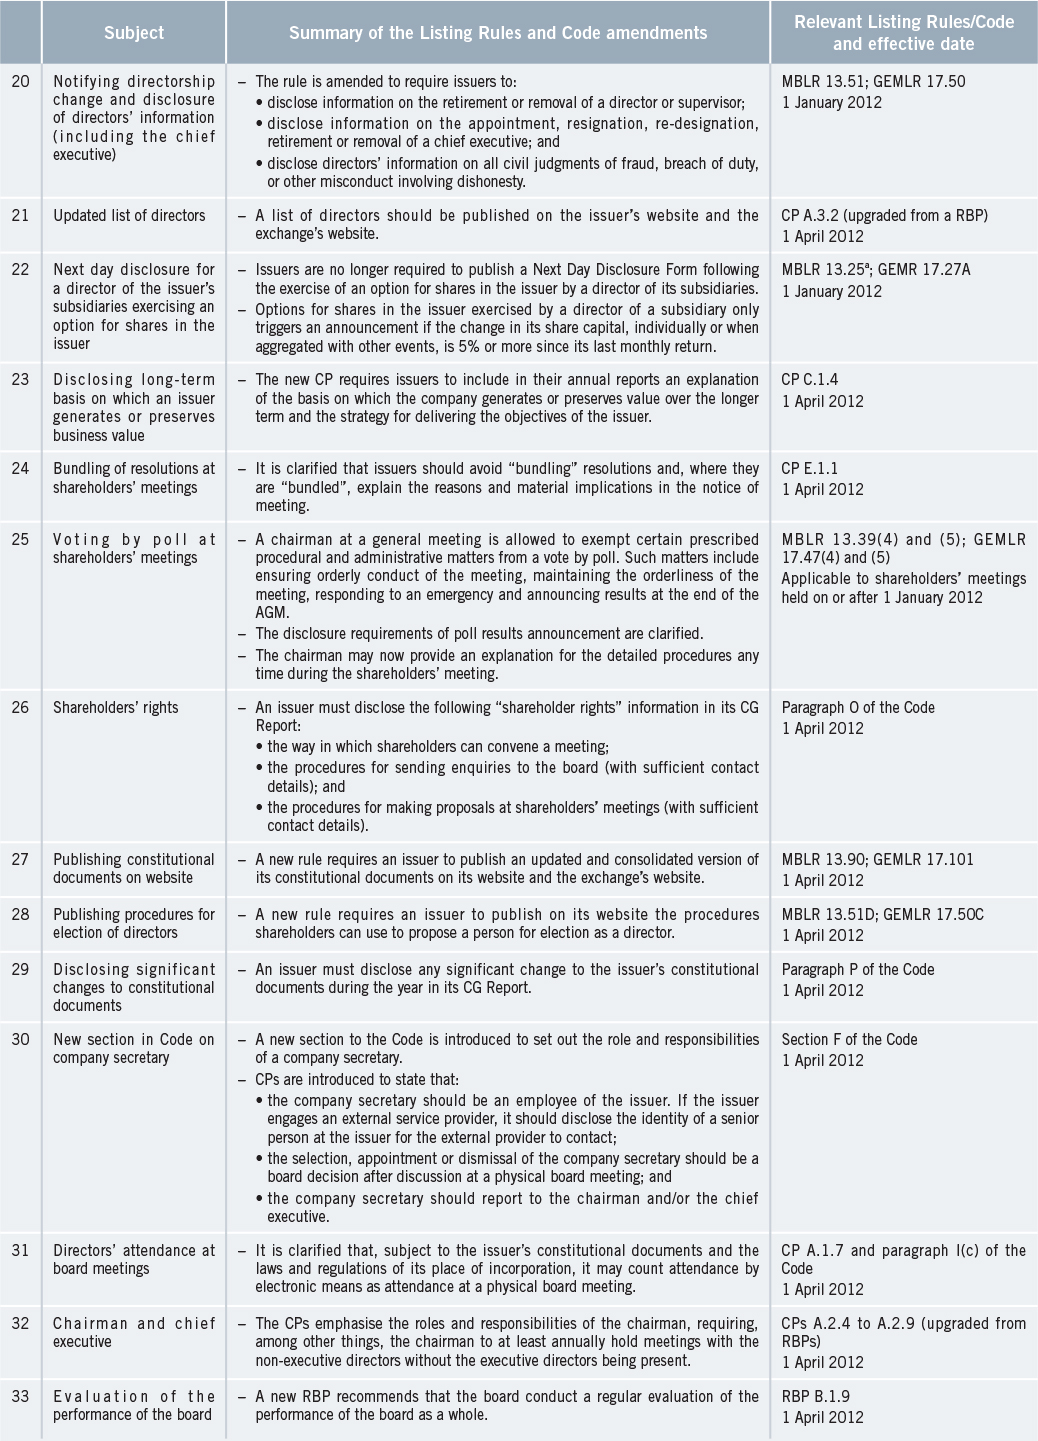 hk-exchange-listing-rules-amended-after-extensive-public-consultation-en-3